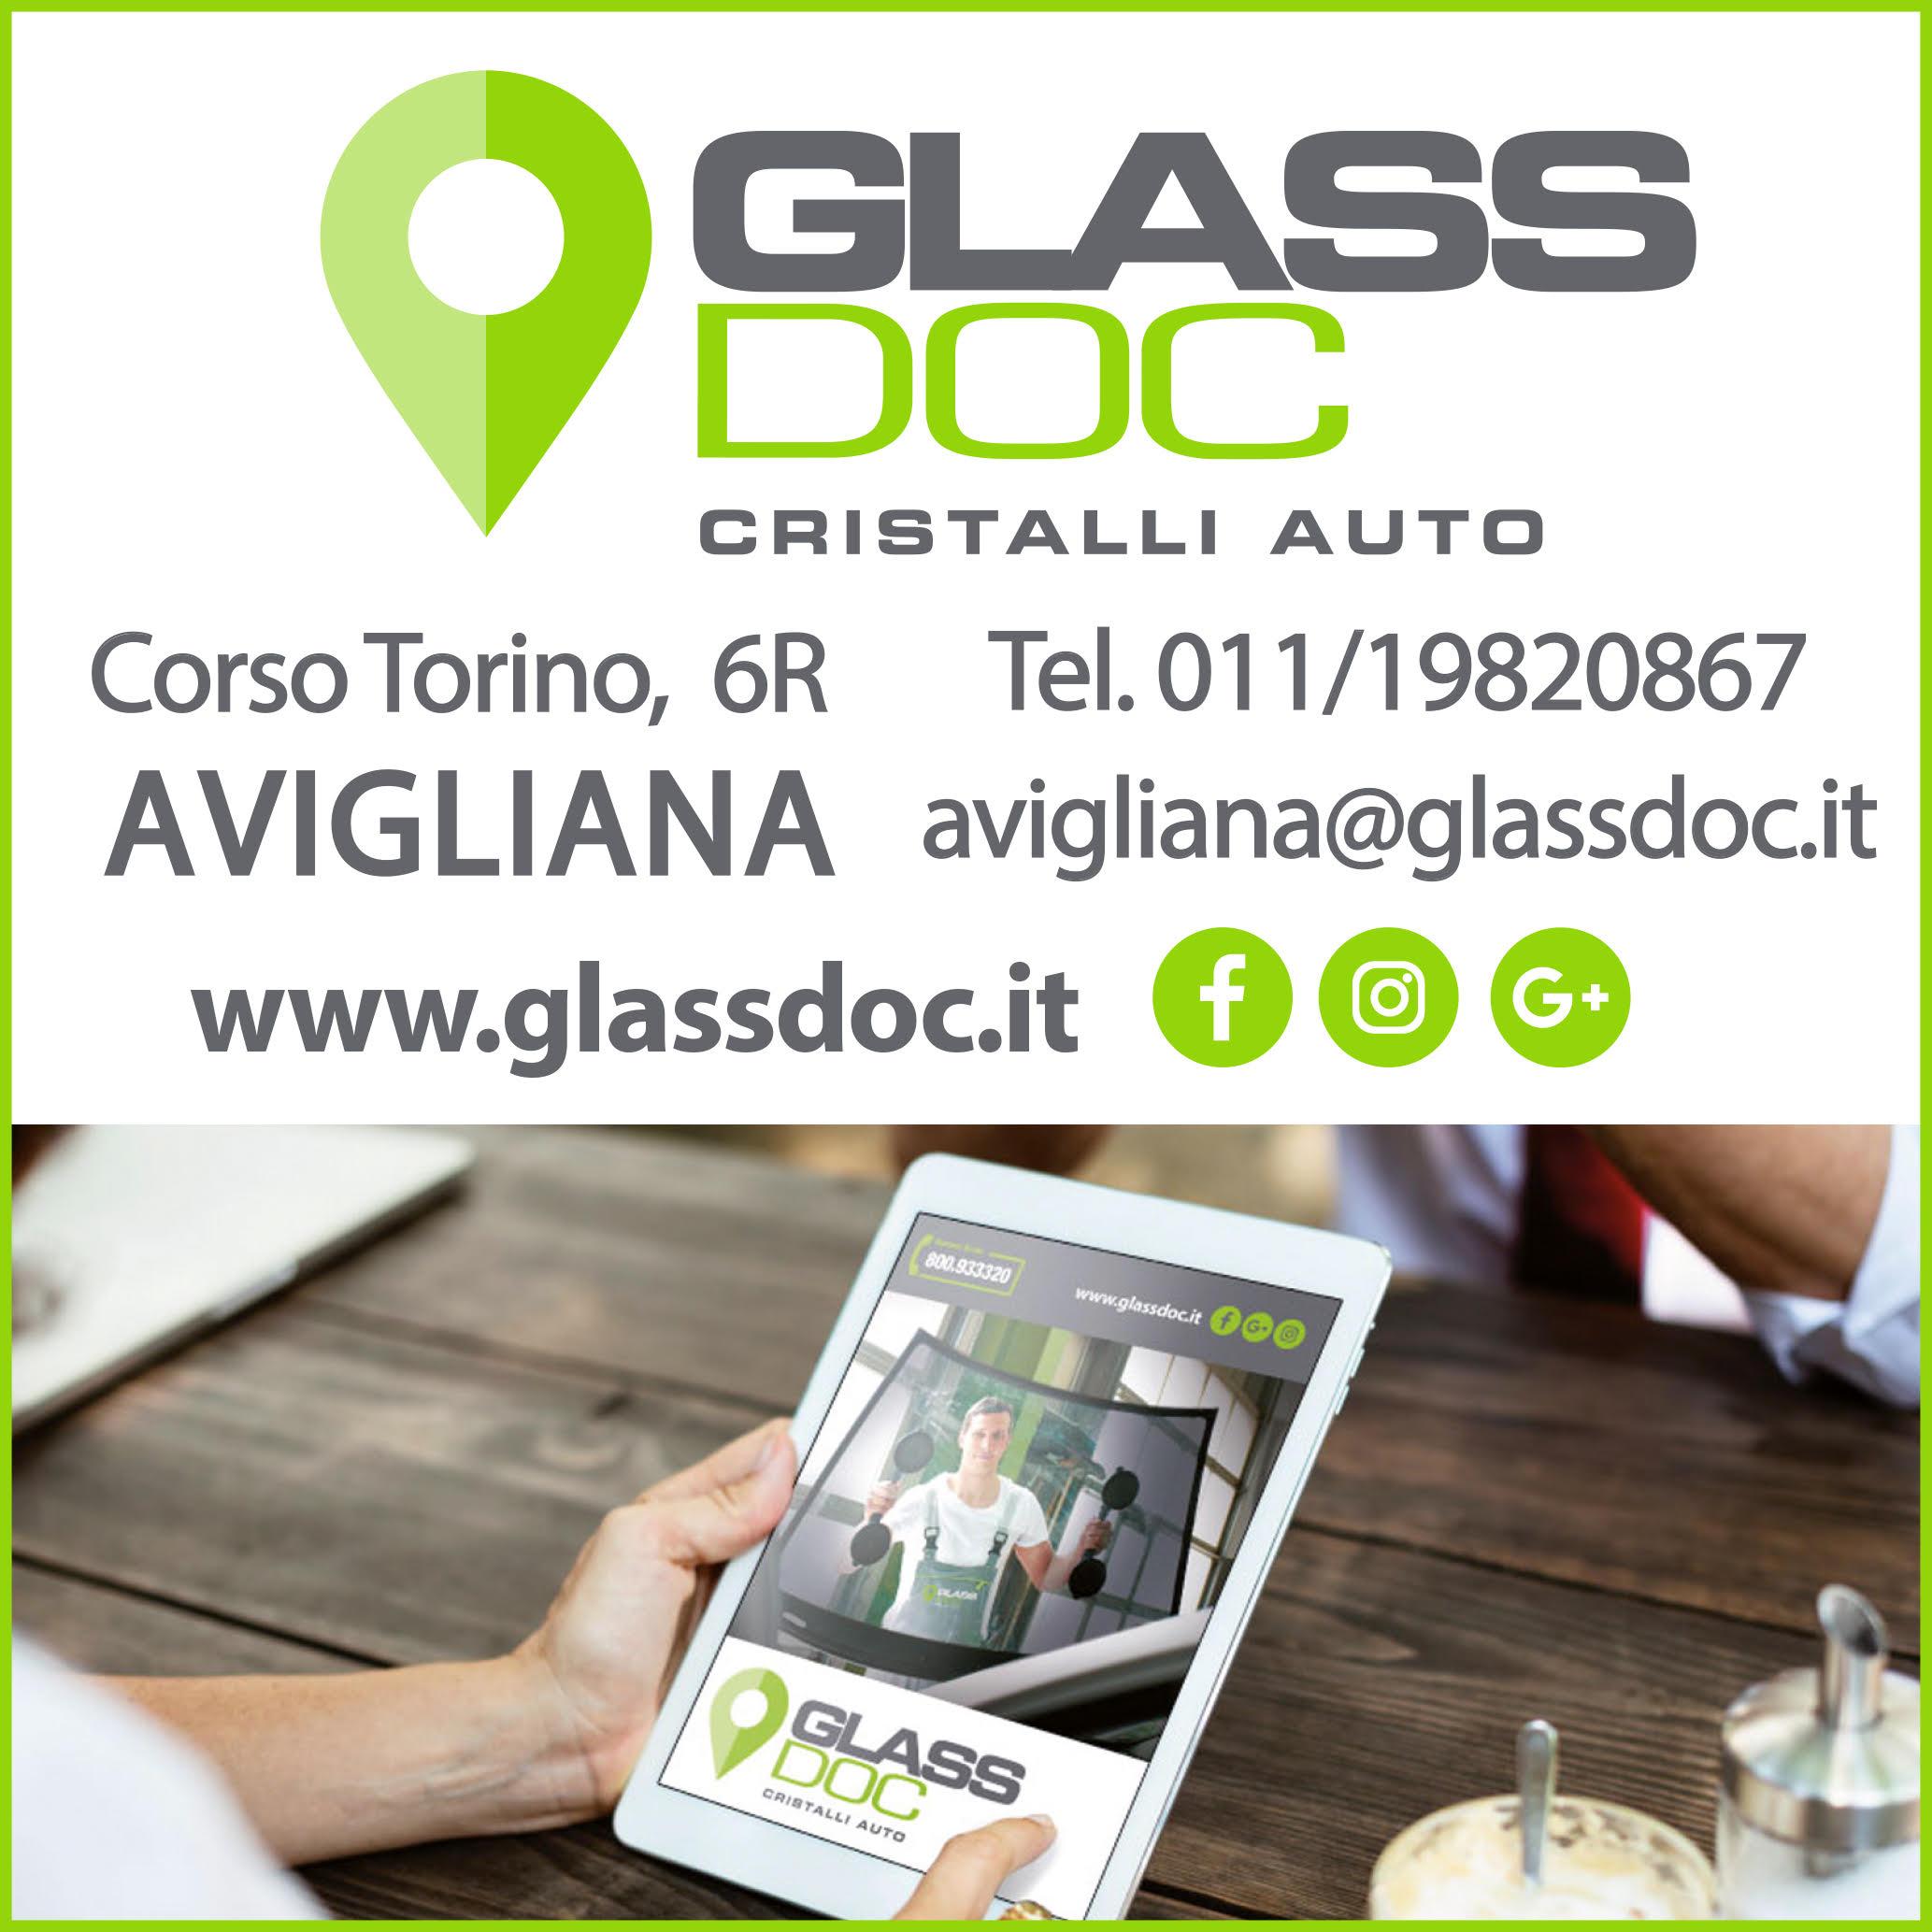 glassdoc